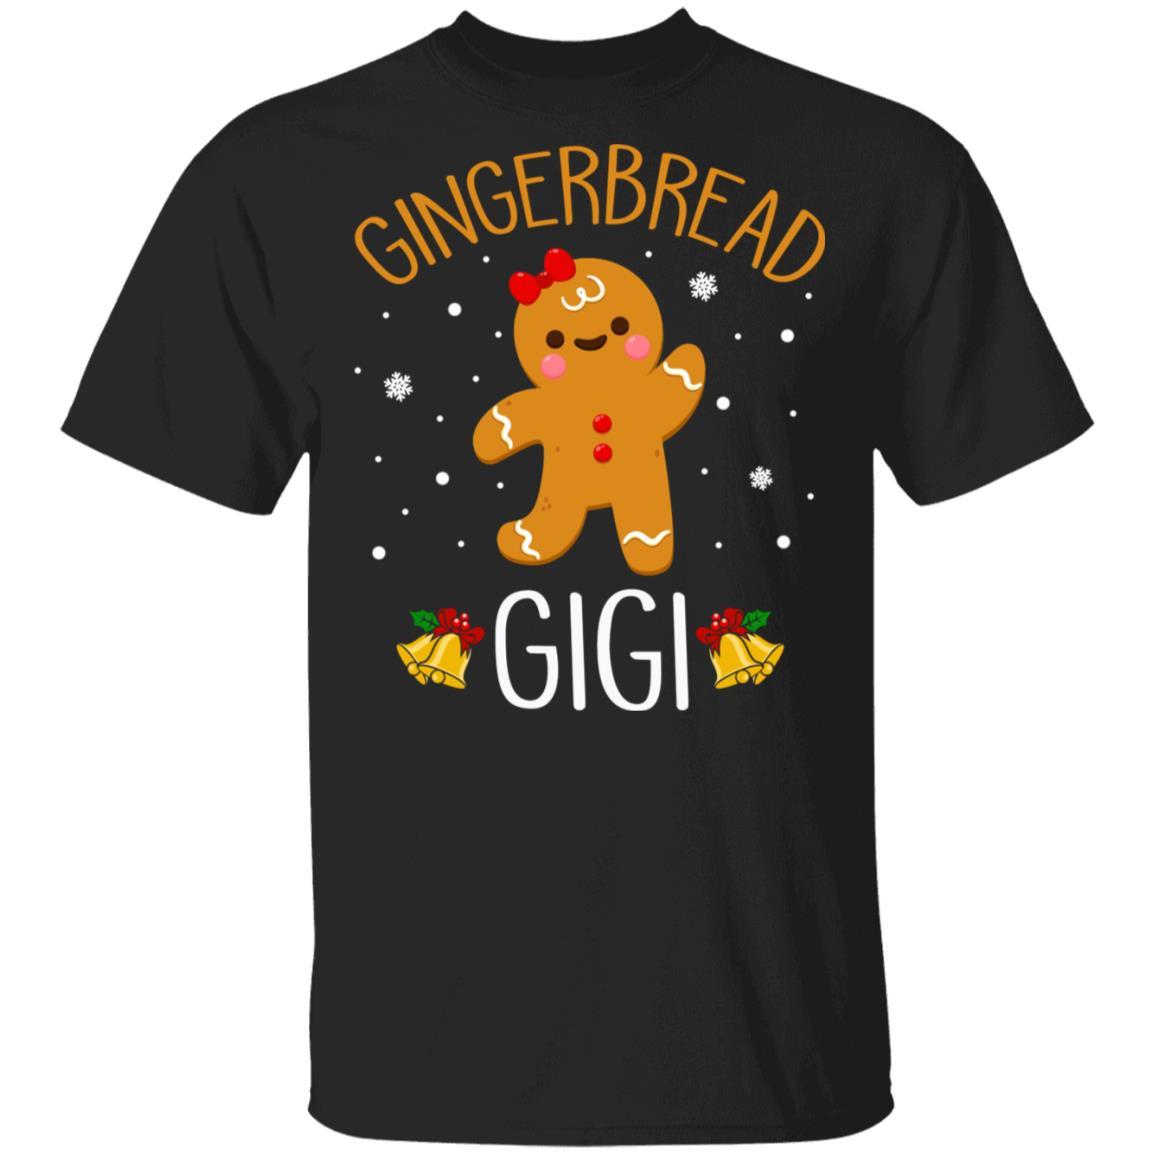 Xmas Cute Gingerbread Men Gigi Christmas Family Unisex Short Sleeve